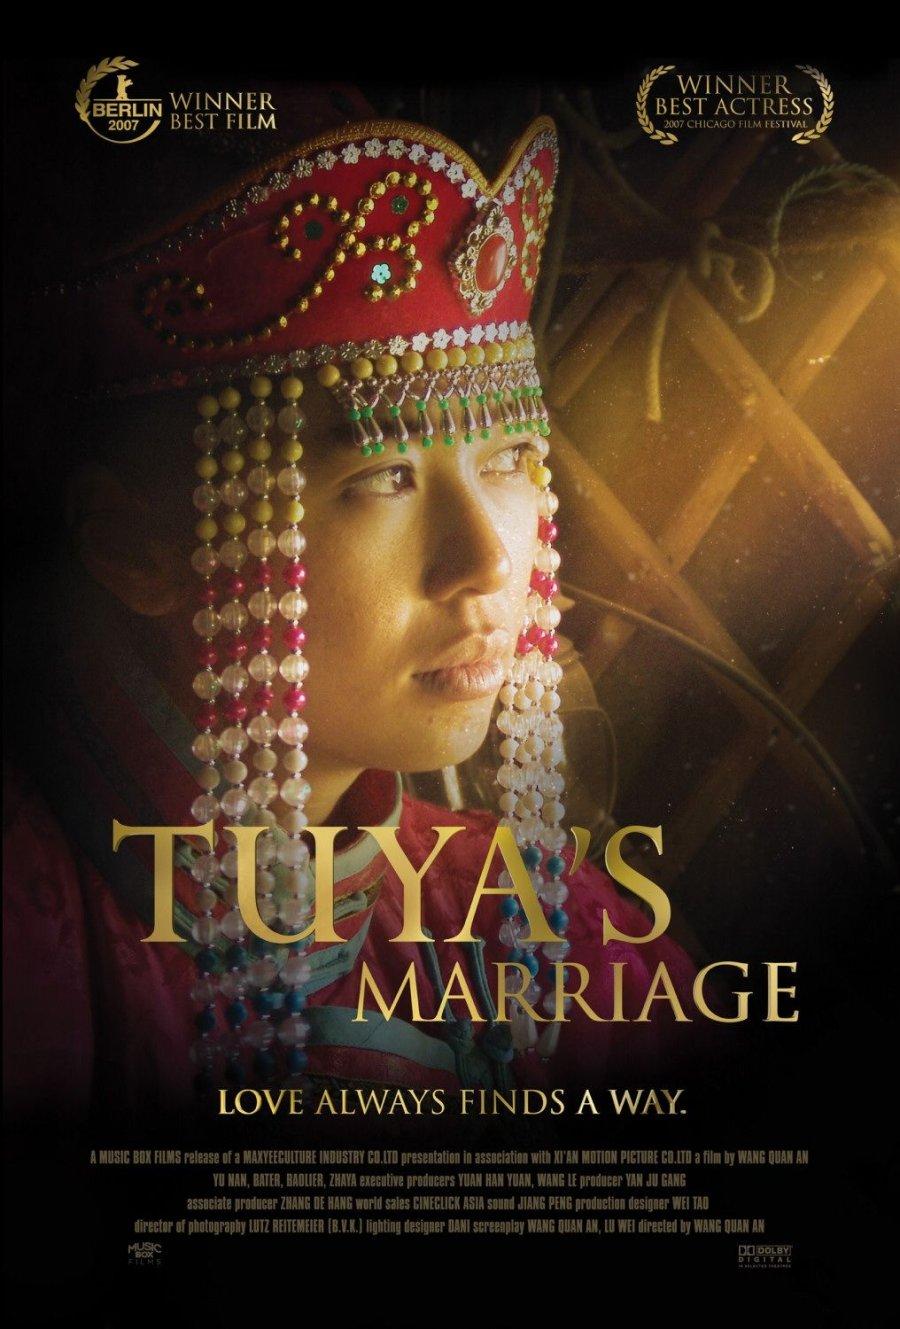 2wJXOf - Свадьба Туи ✸ 2006 ✸ Китай